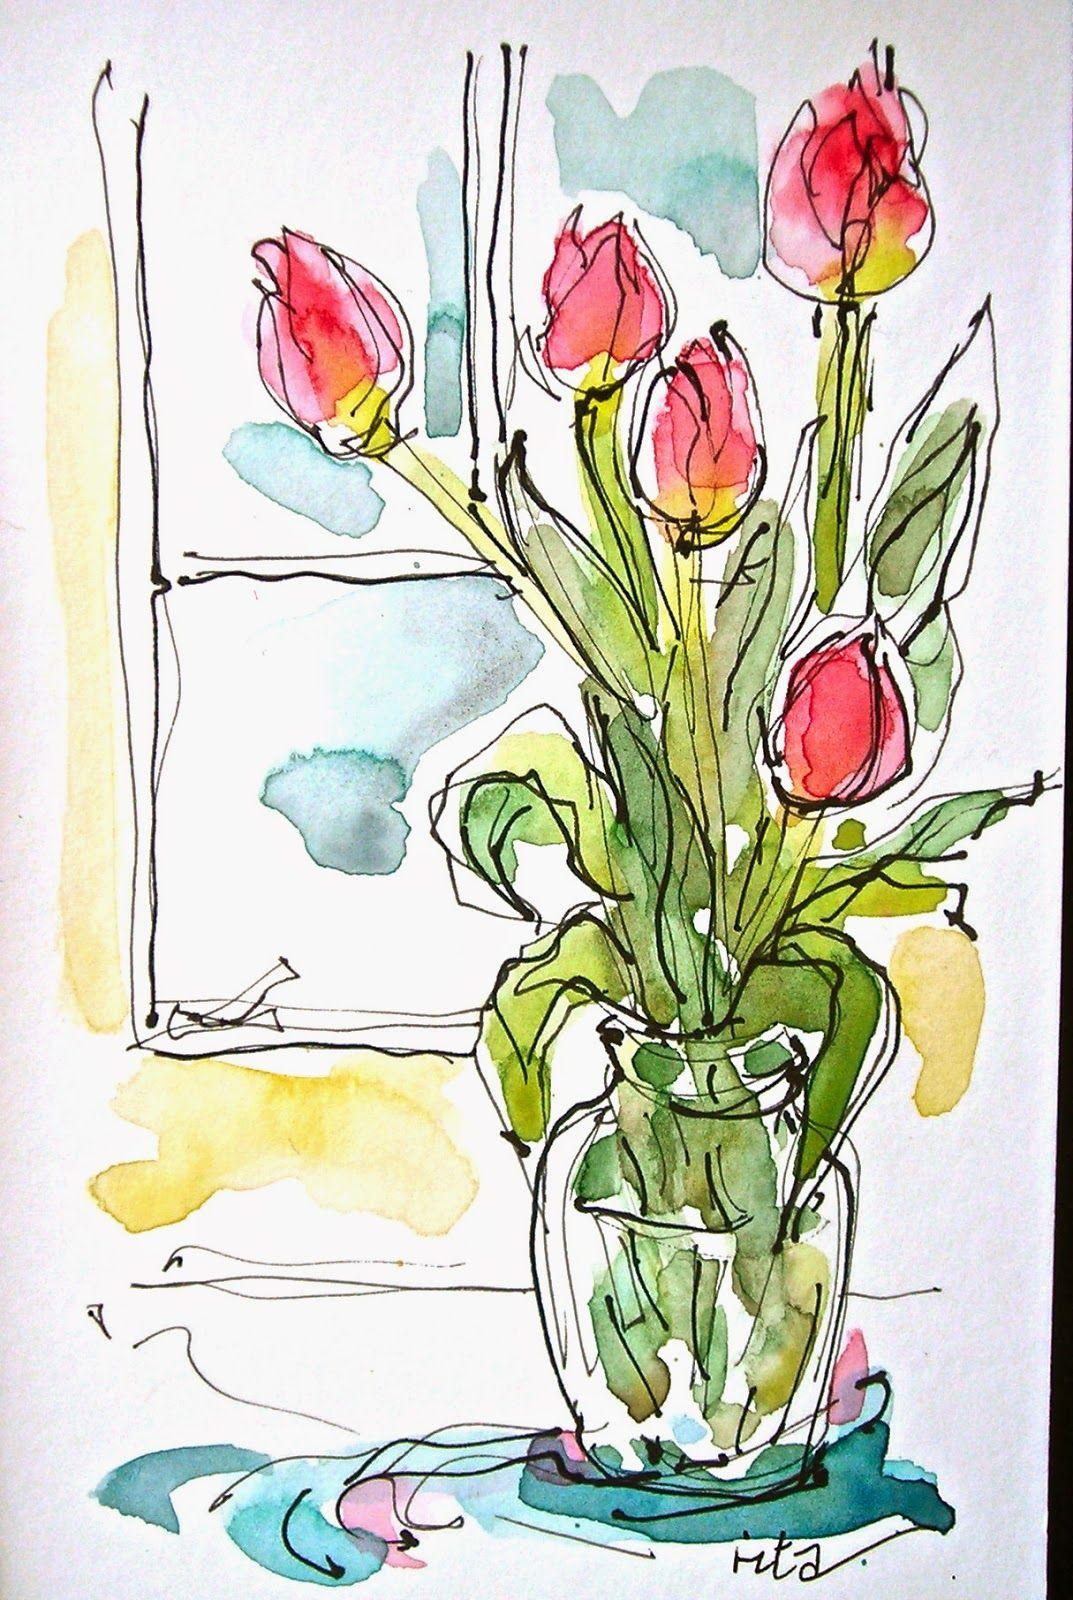 Sketchbook Wandering: Illustration--Love the Simplicity!